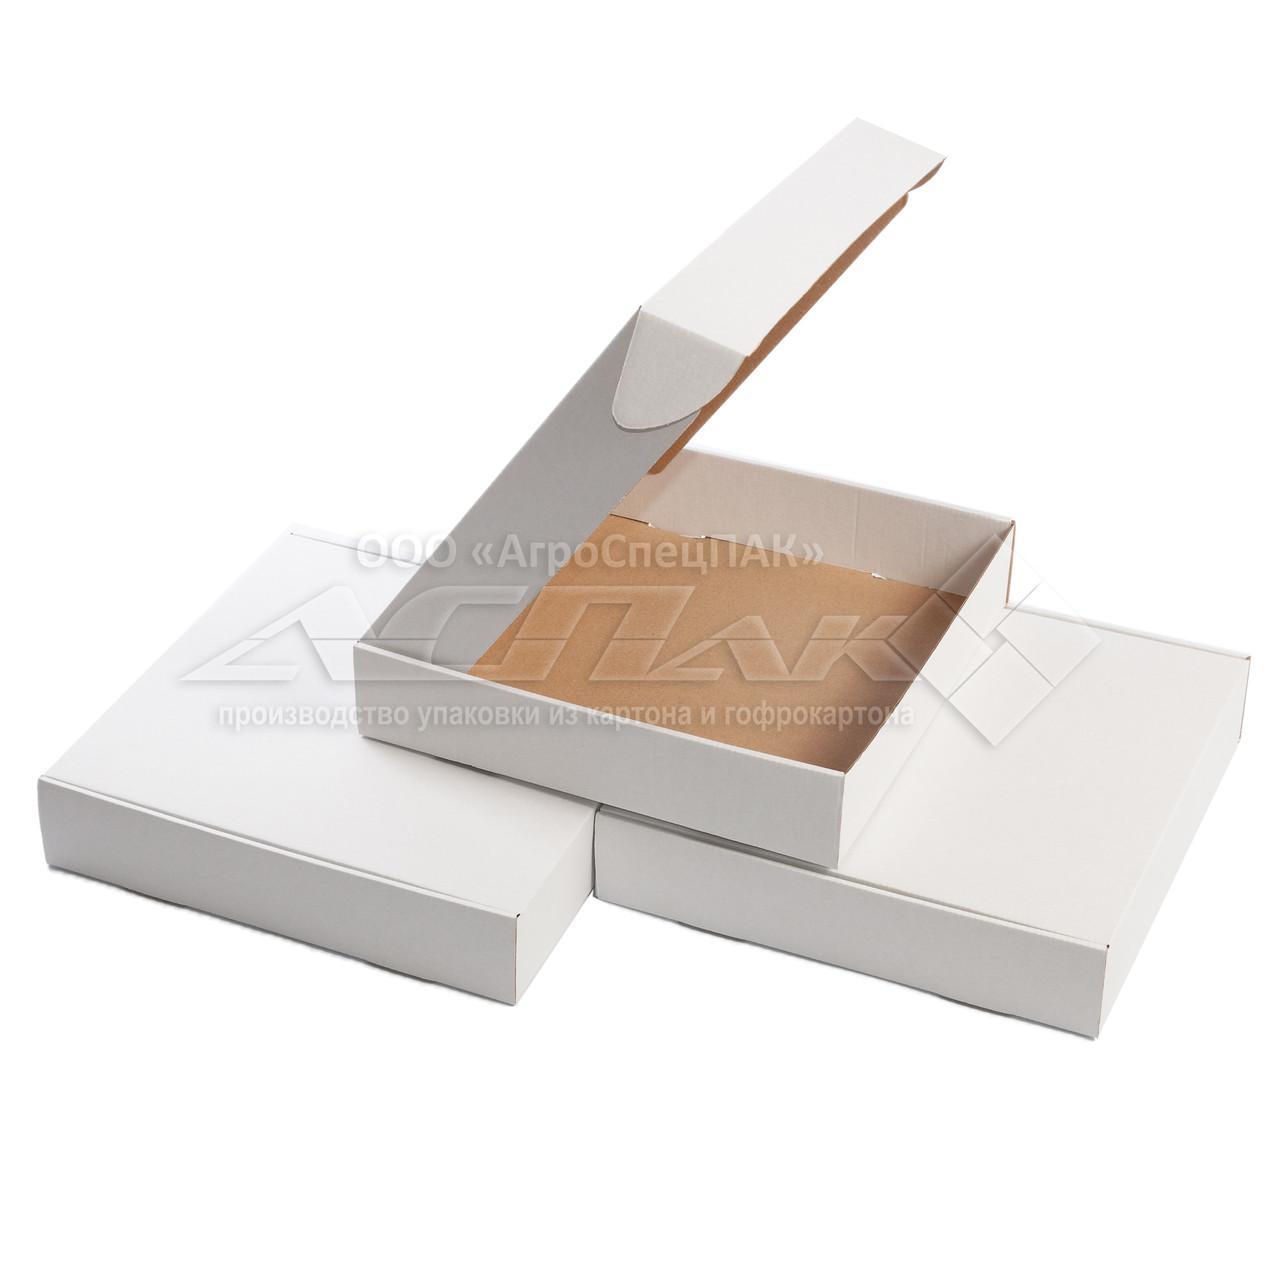 Картонные коробки 200*200*41белые